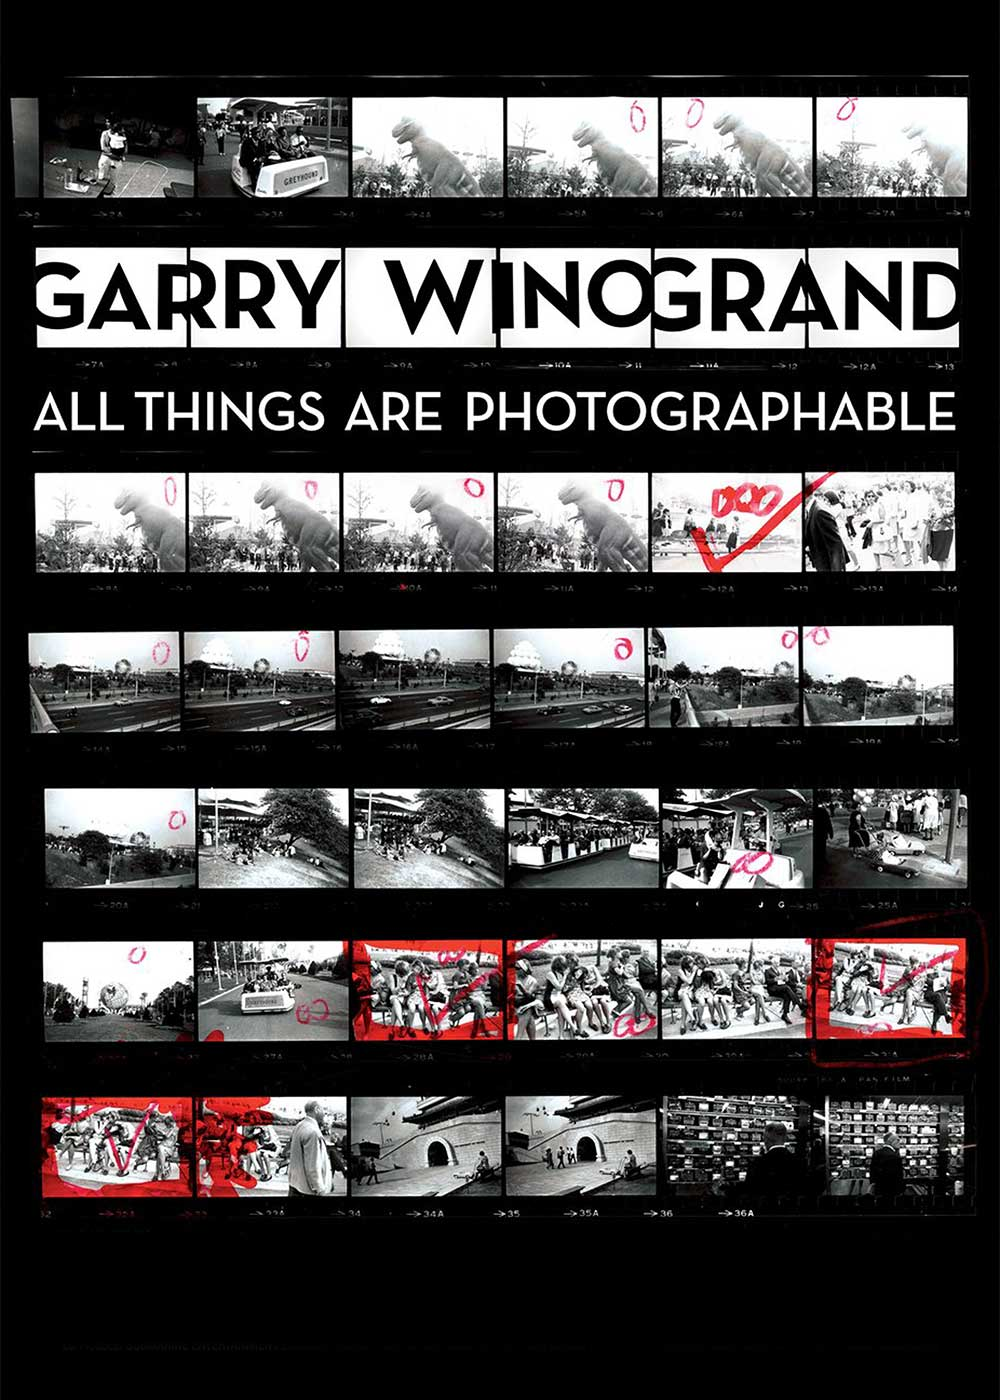 garrywinogrand_poster.jpg